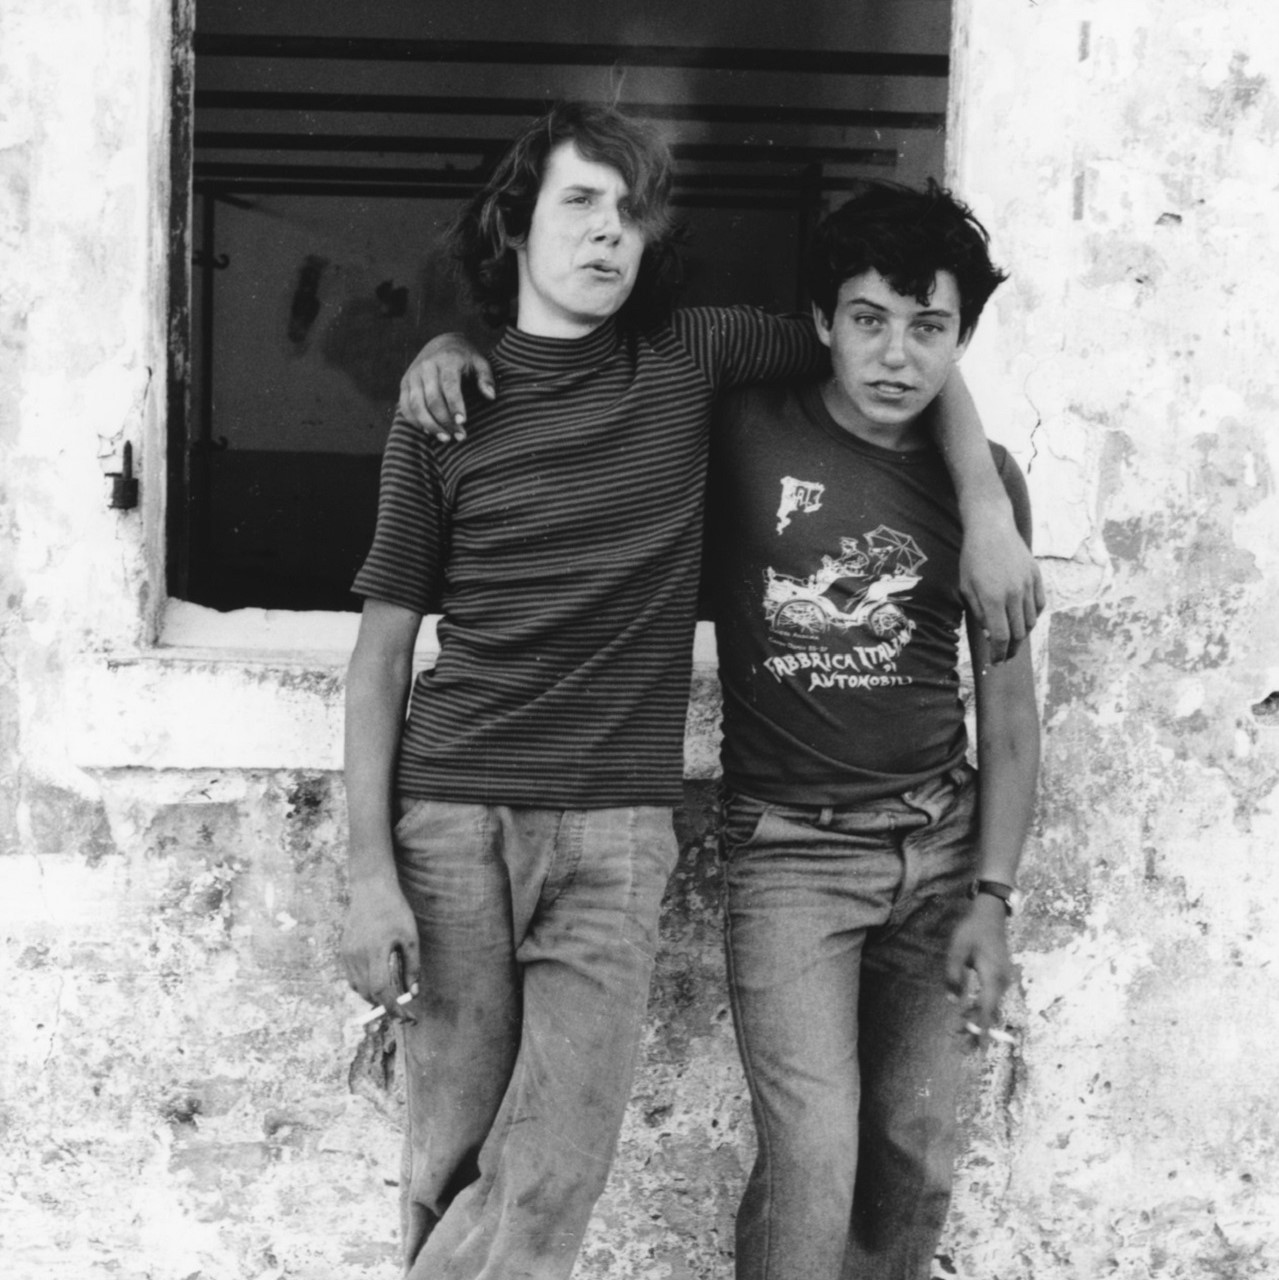 MAN di Nuoro | GUIDO GUIDI | IN SARDEGNA: 1974, 2011